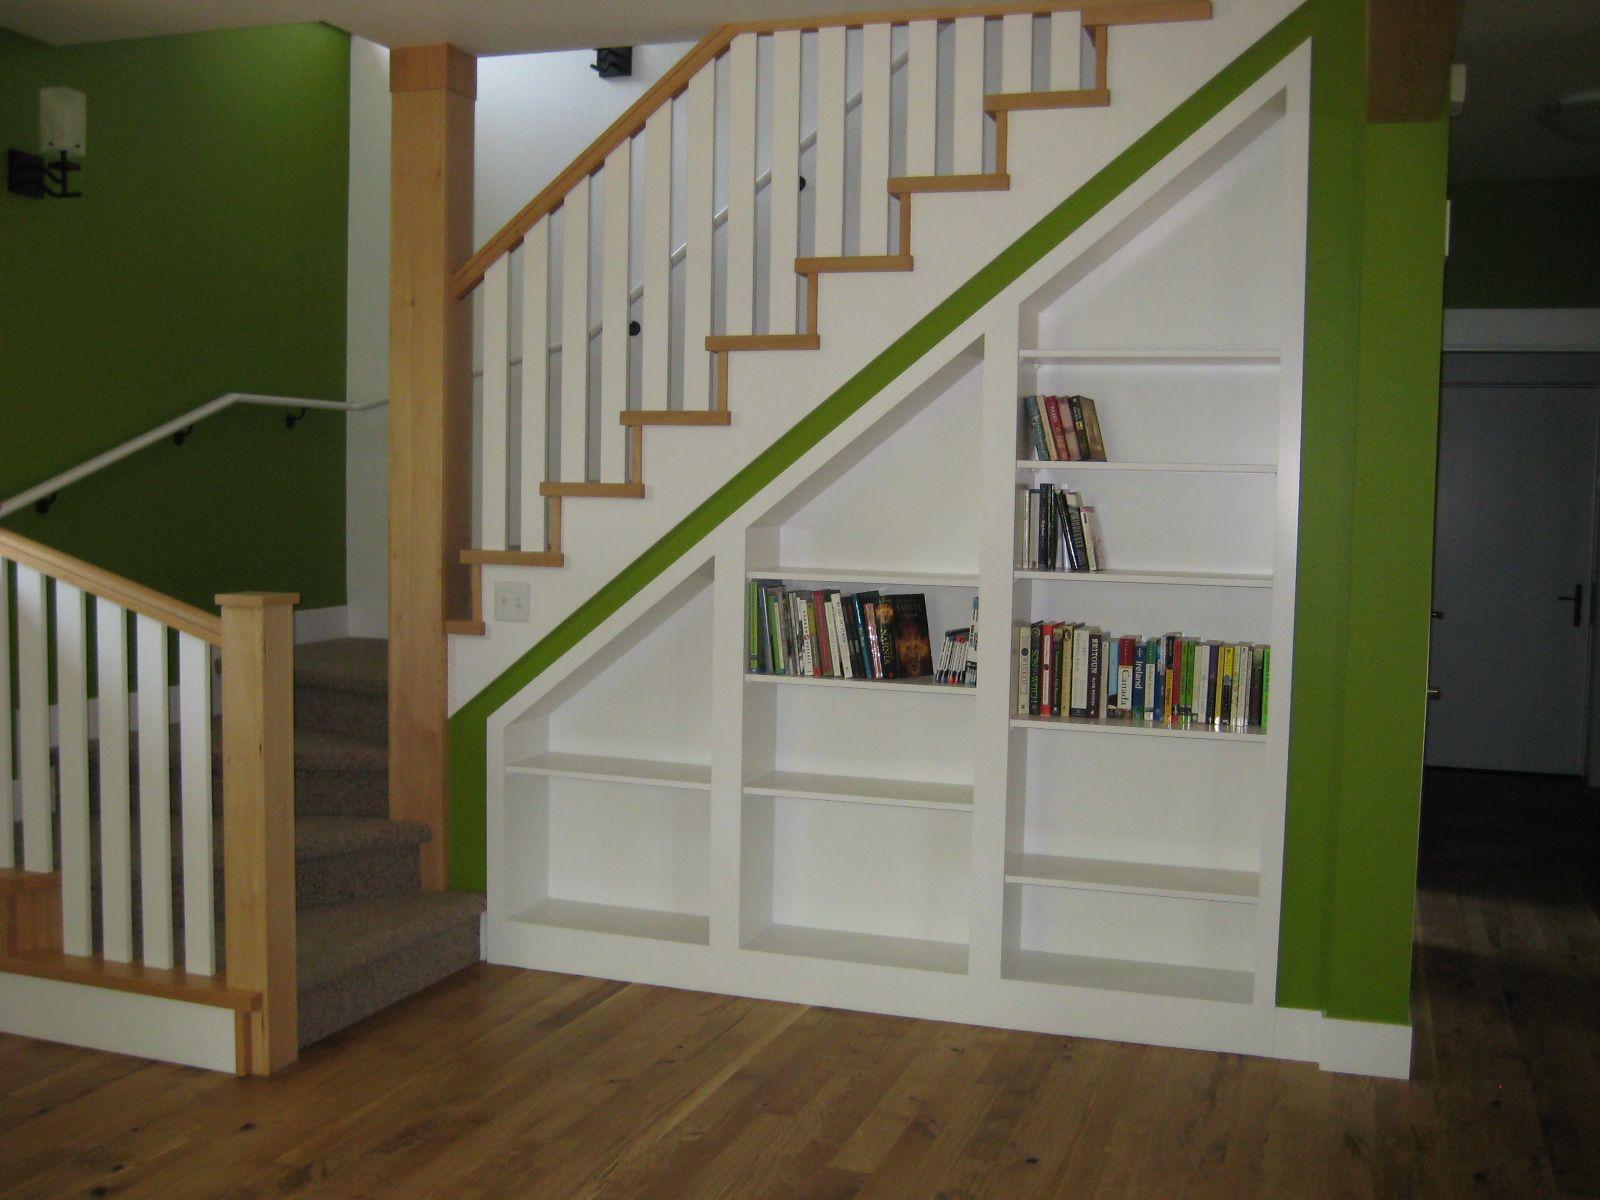 Architecture White Bookshelves Under The White Wooden Staircase